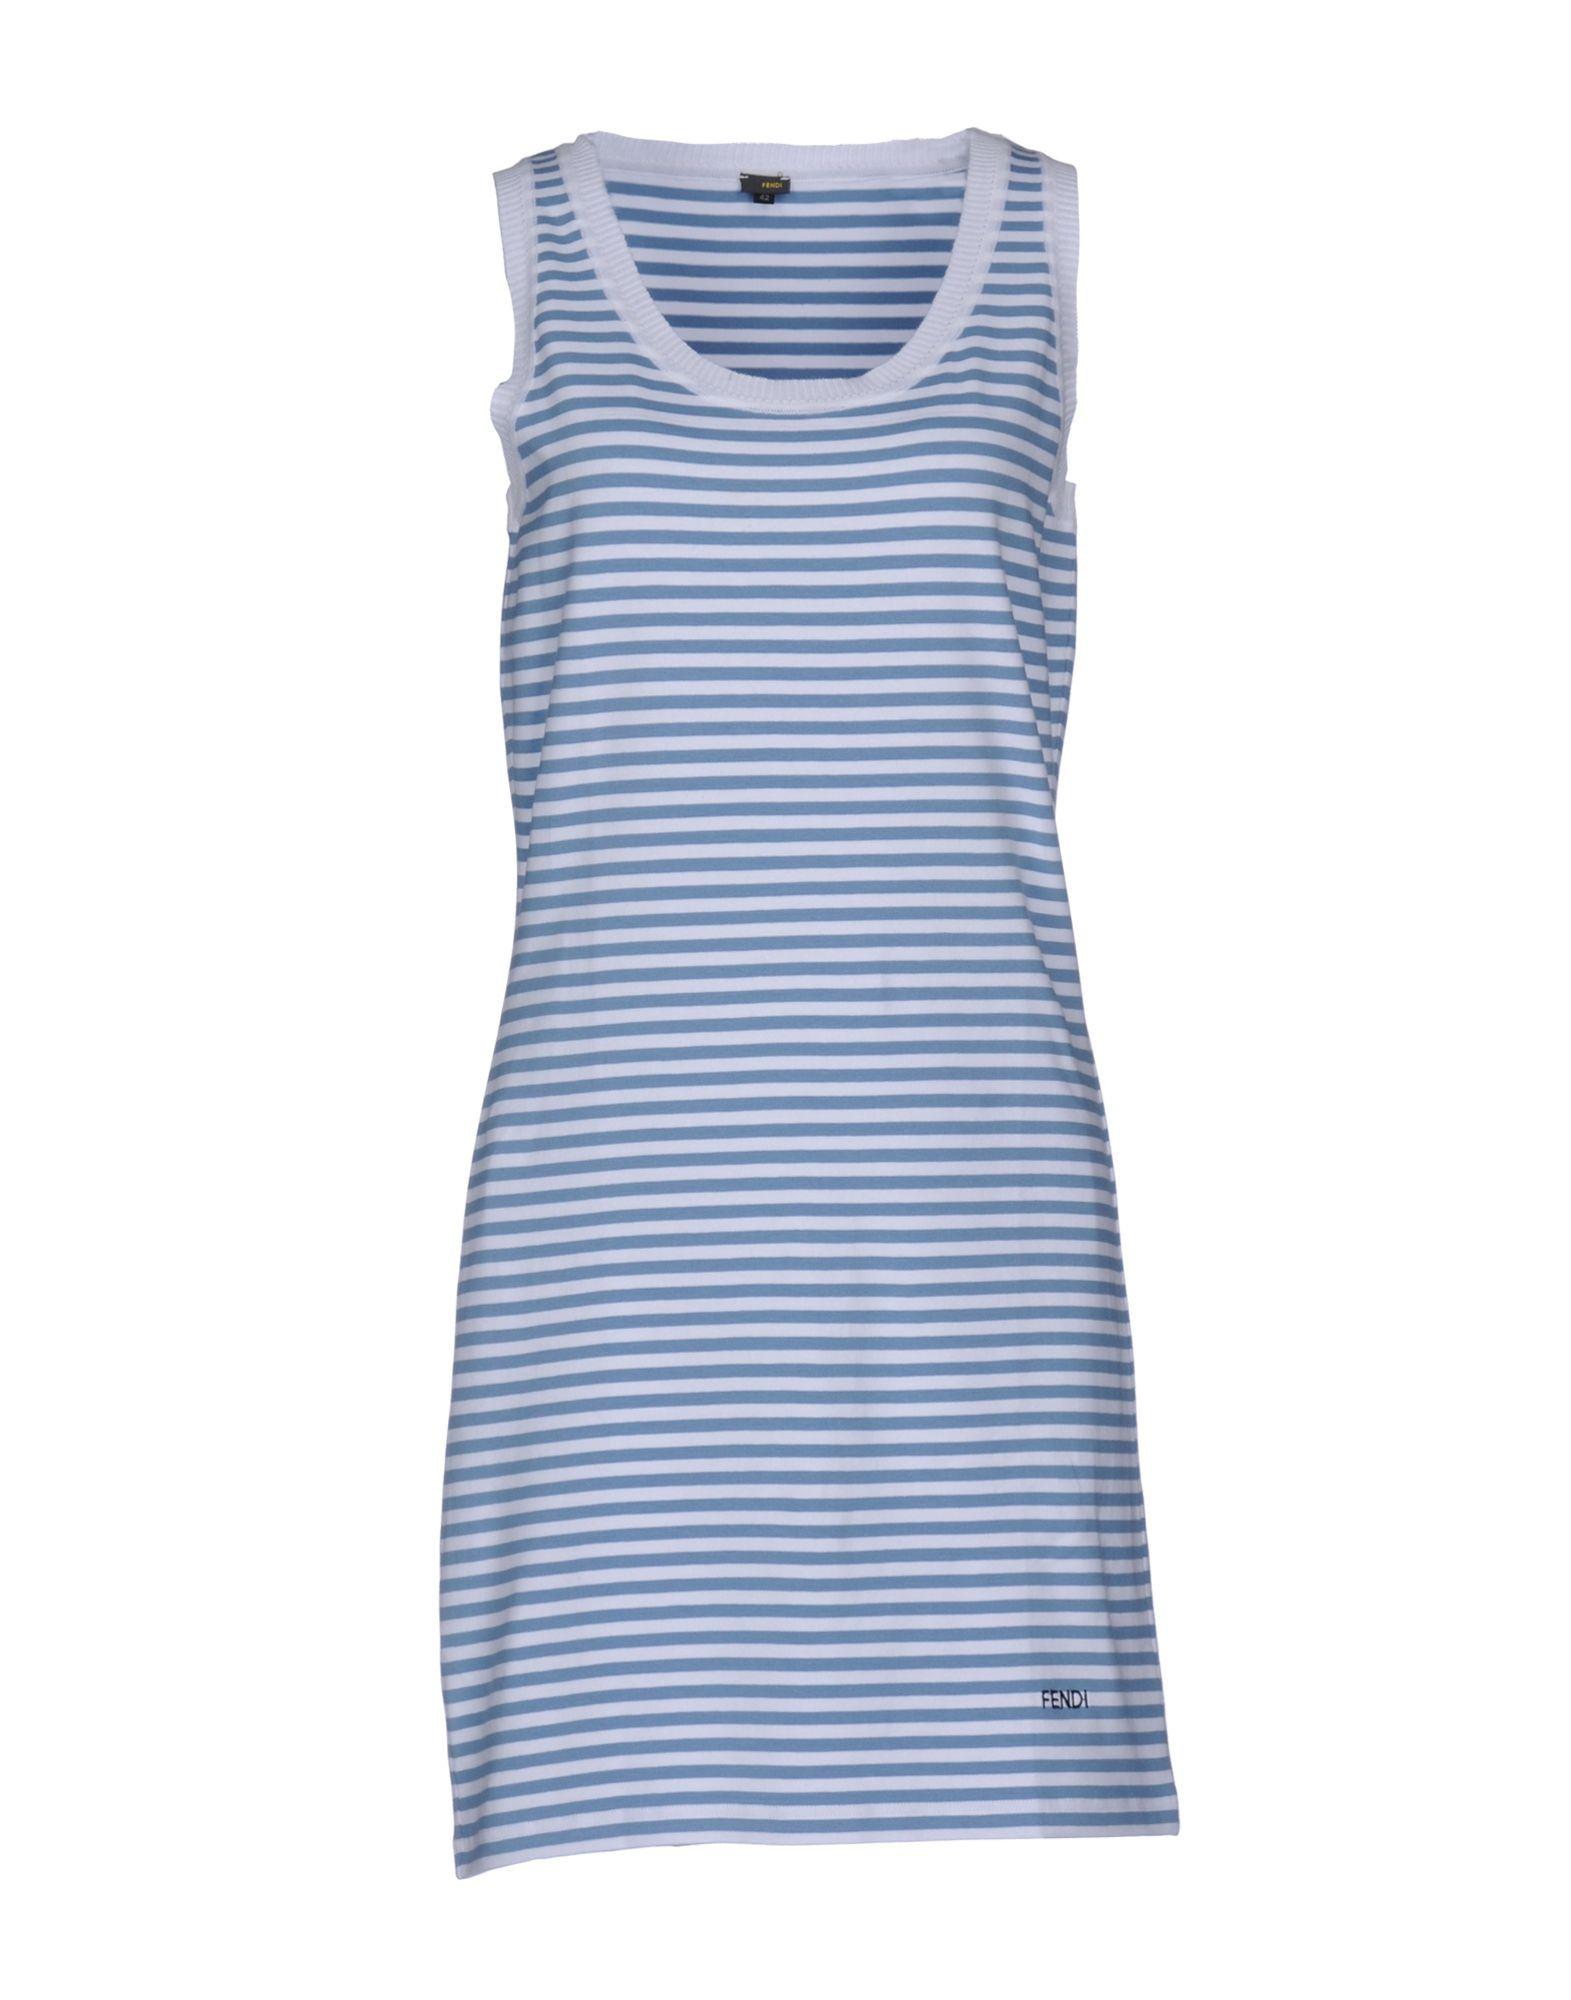 Fendi Azure Stripe Cotton Sleeveless Dress